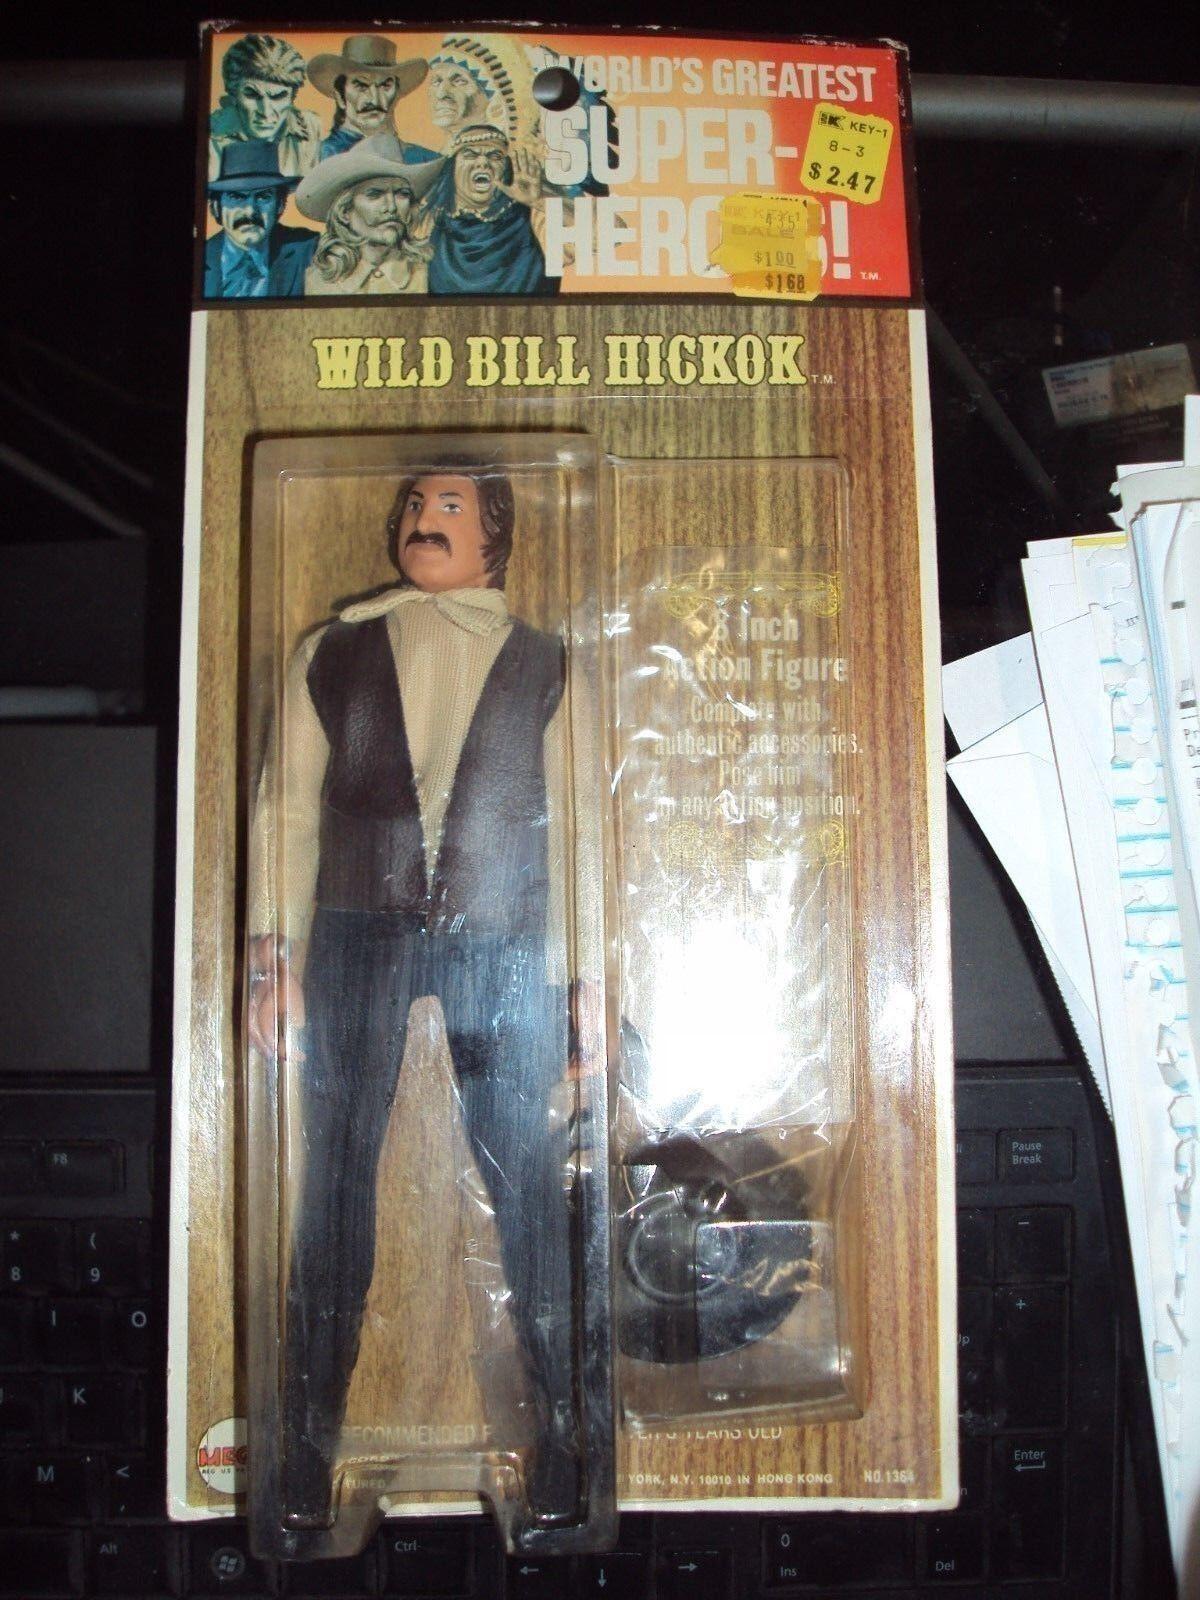 Mego Wild Bill Hickok WGSH kresge 1973